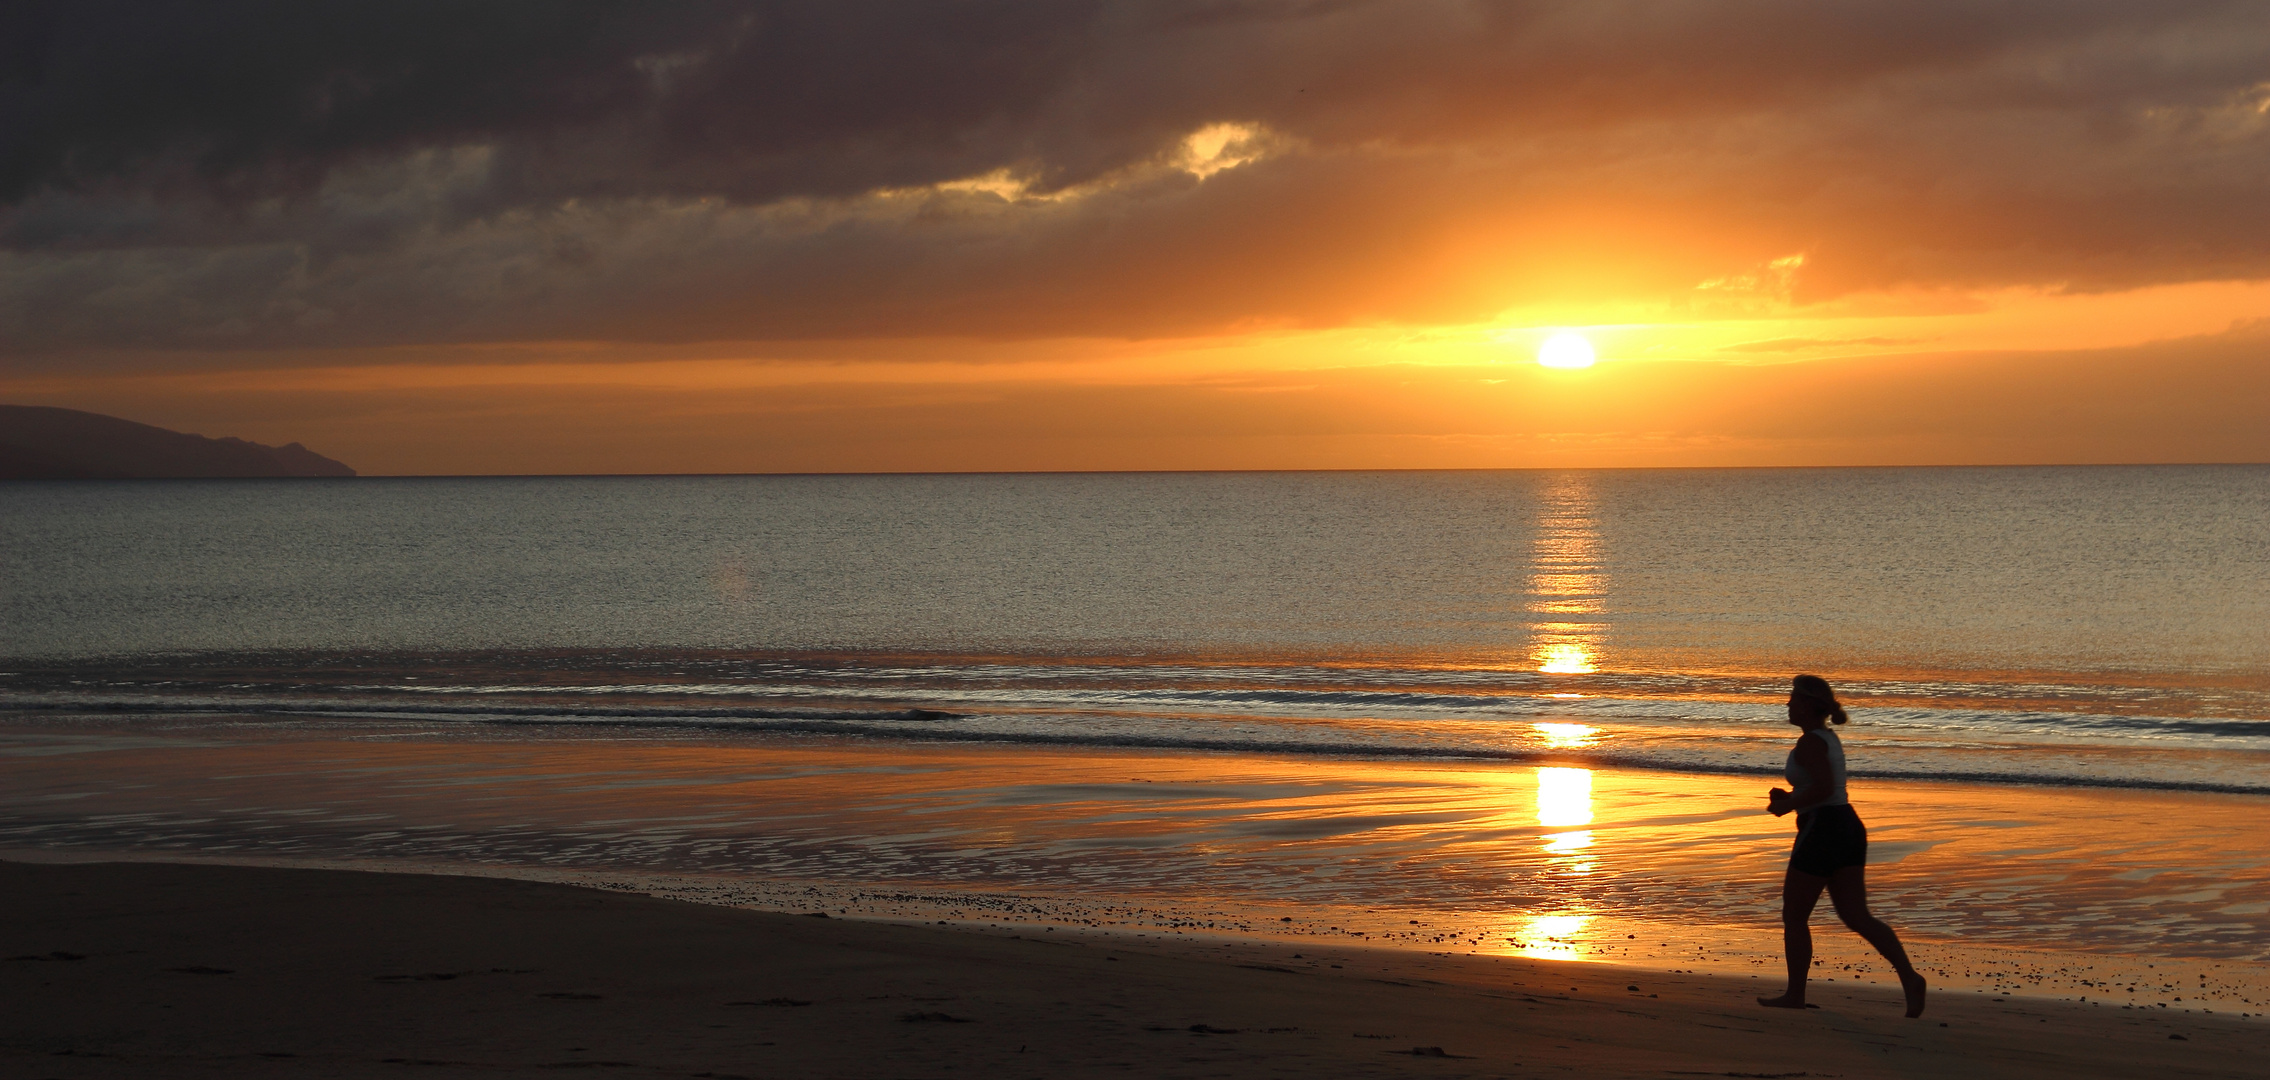 Sonnenaufgang über dem Atlantik